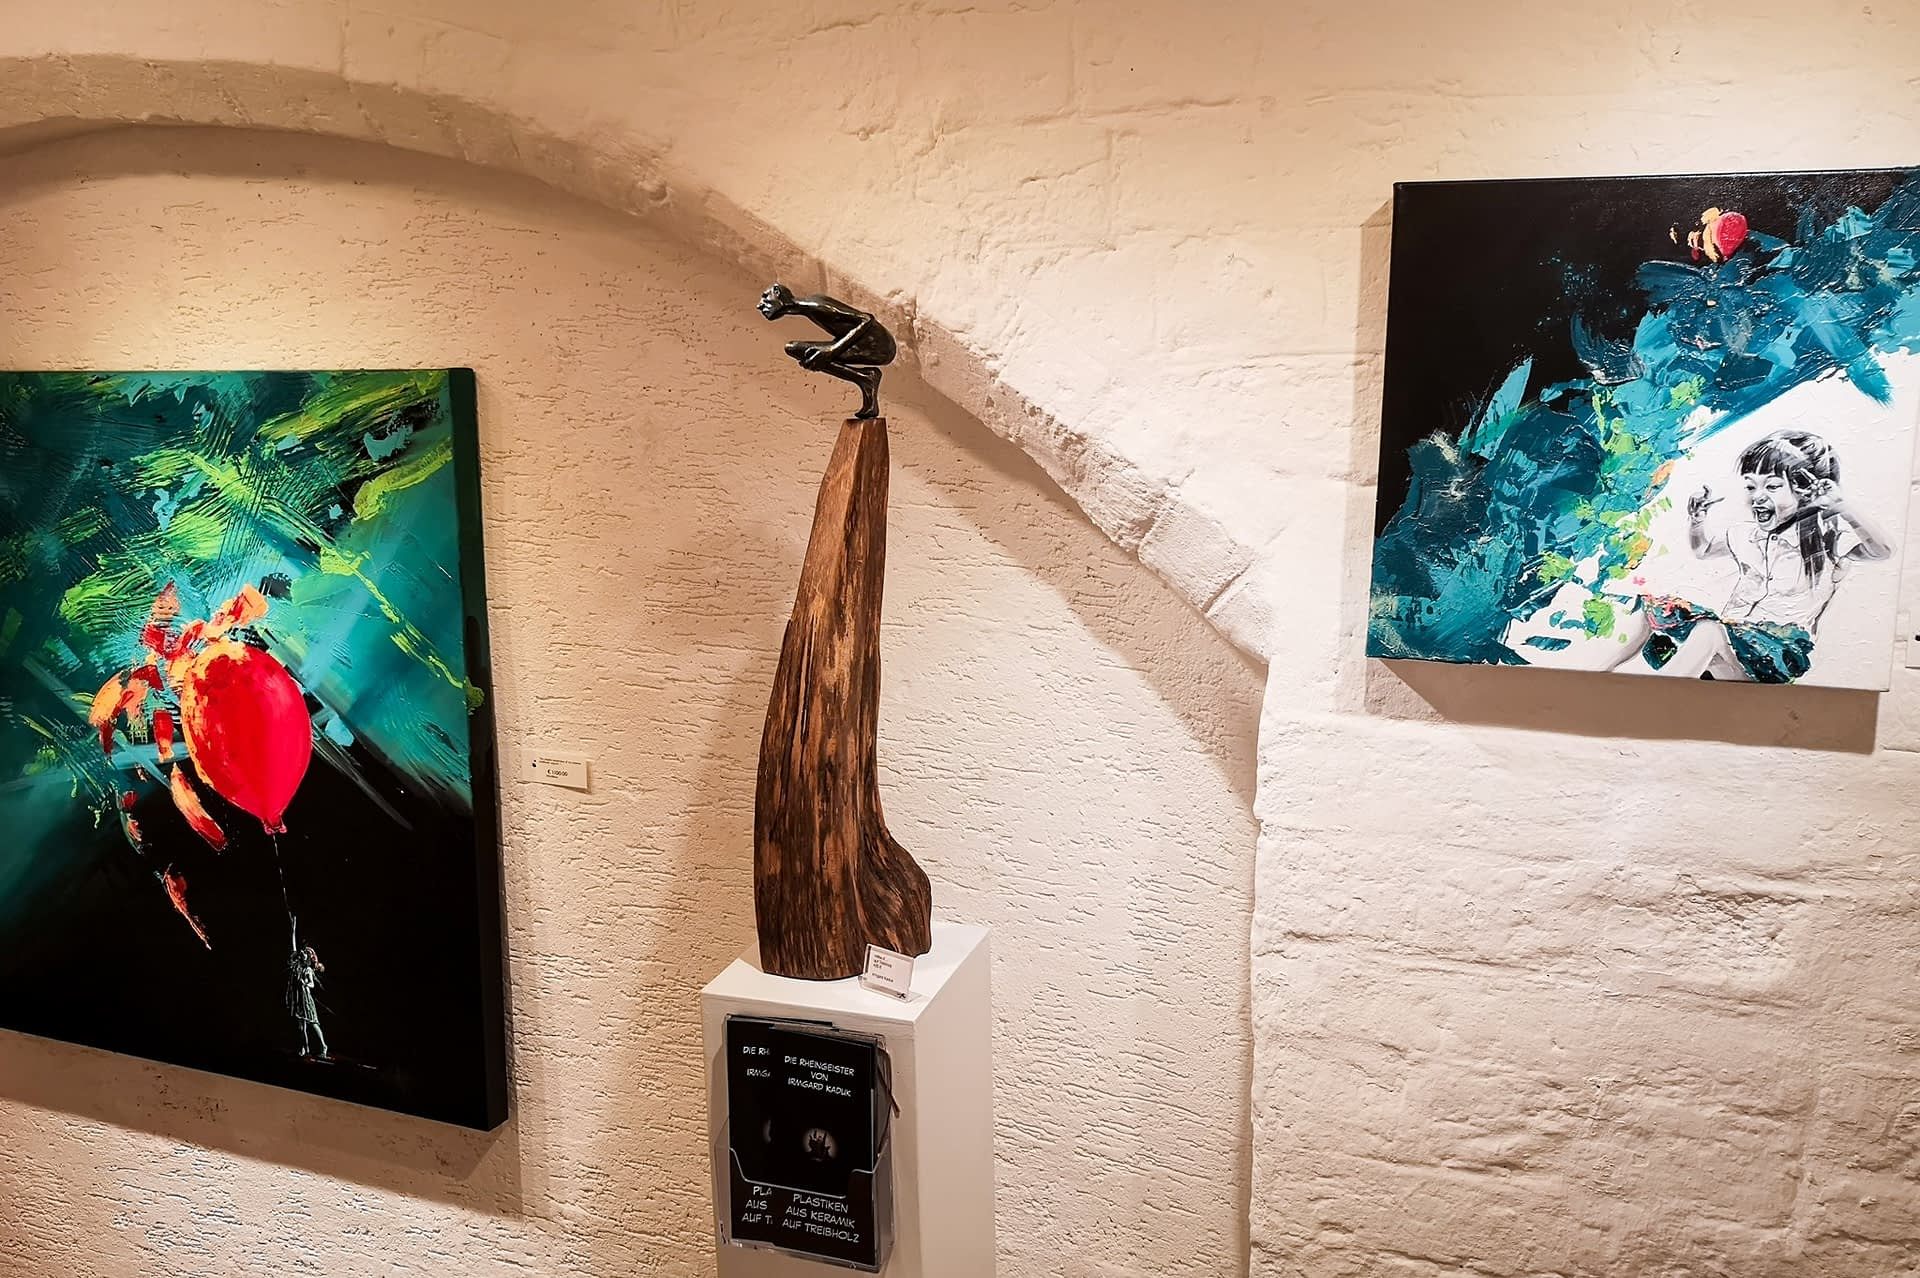 Kunstausstellung Les lignes du chaos: Impression der Creative Wand